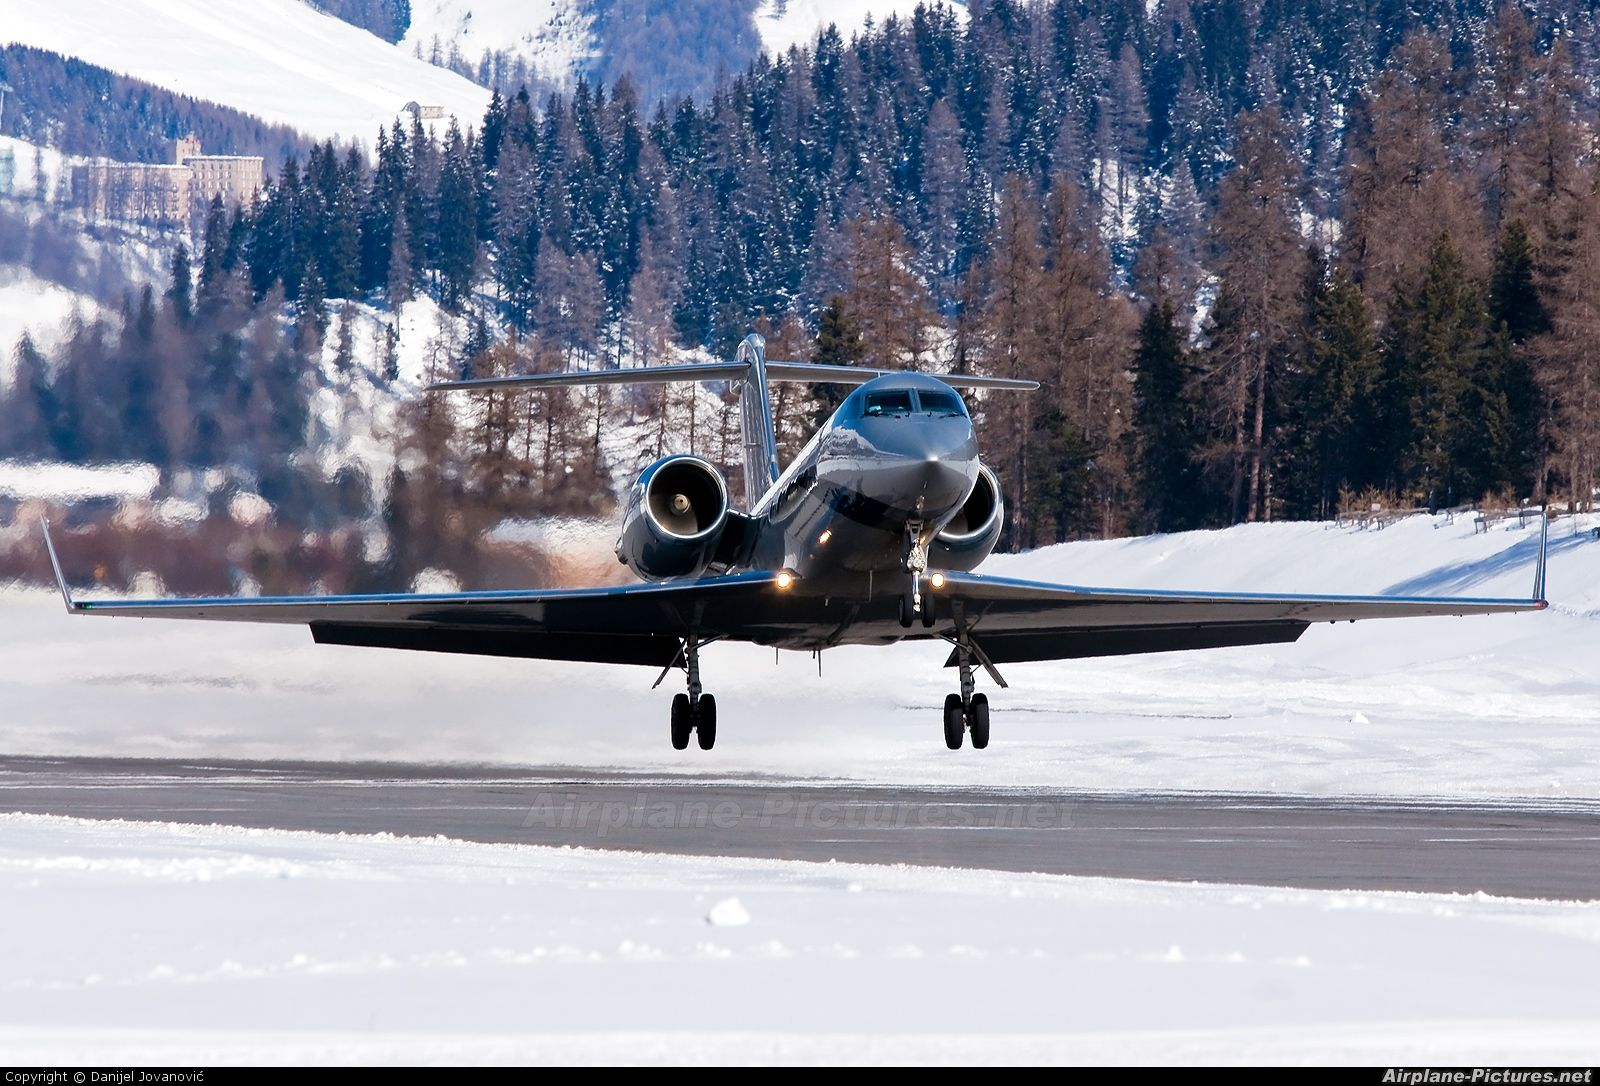 Windrose Air Gulfstream Aerospace G-IV, G-IV-SP, G-IV-X, G300, G350, G400, G450 D-AJGK Switzerland - Samedan - Engadin (SMV / LSZS)